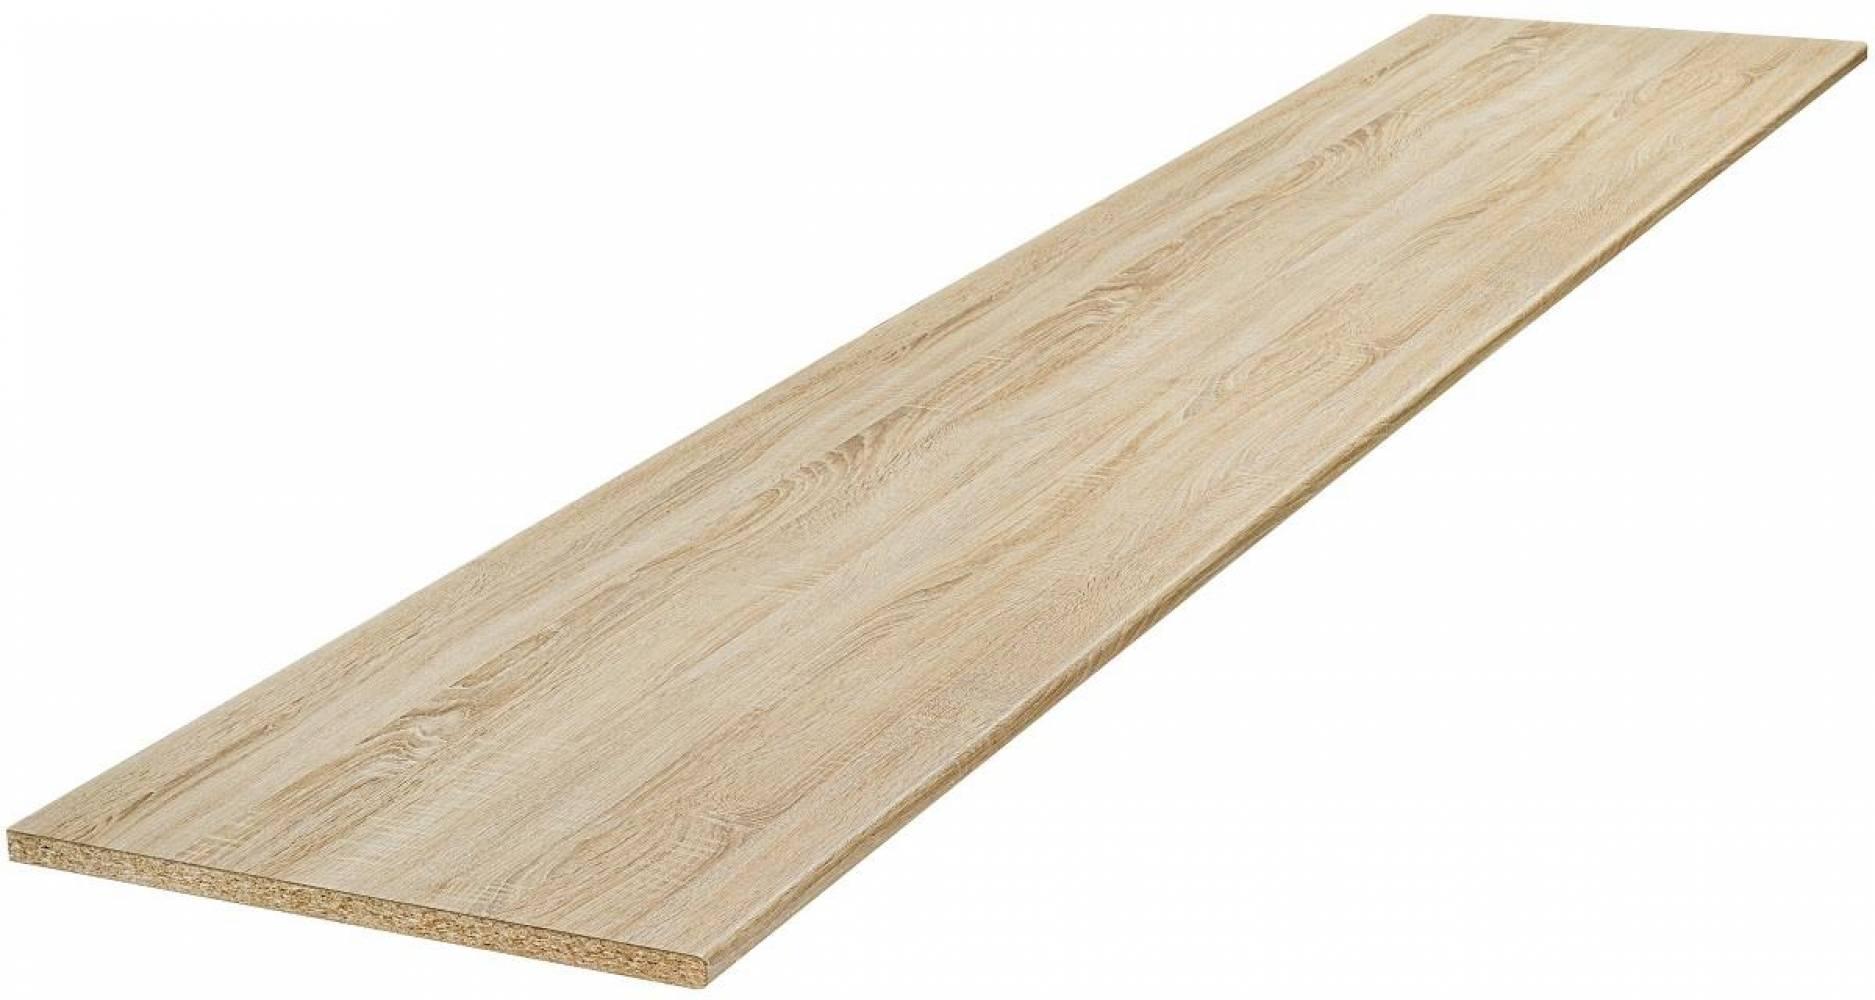 Столешница № 323 П Канадский дуб 26 мм Матовая Скиф, цена  за пог/метр